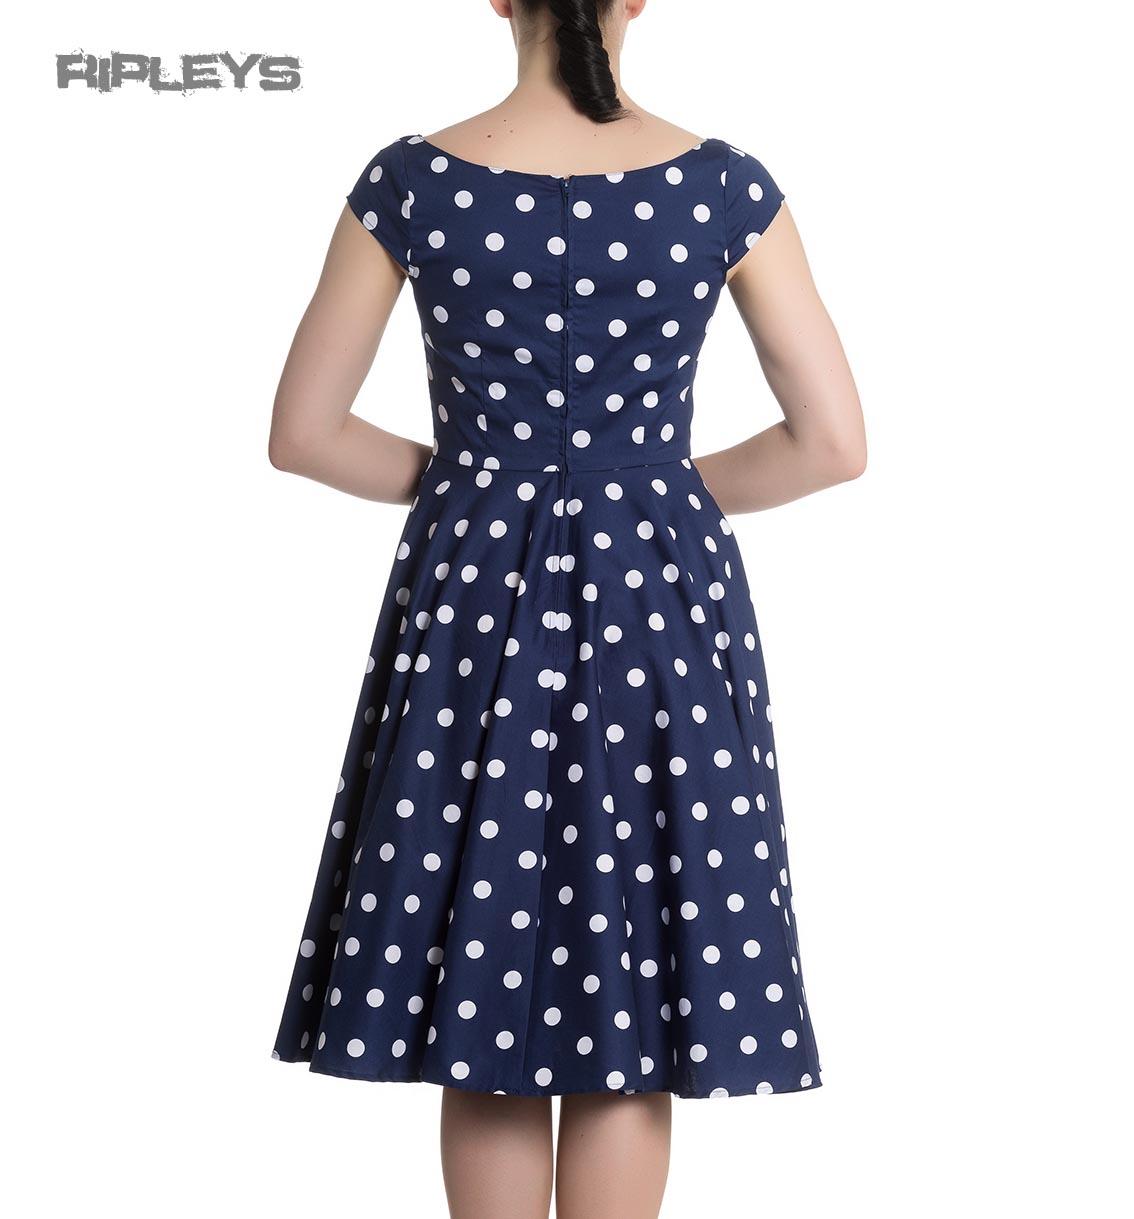 Hell-Bunny-50s-Dress-Polka-Dot-NICKY-Pin-Up-Rockabilly-Navy-Blue-All-Sizes thumbnail 6